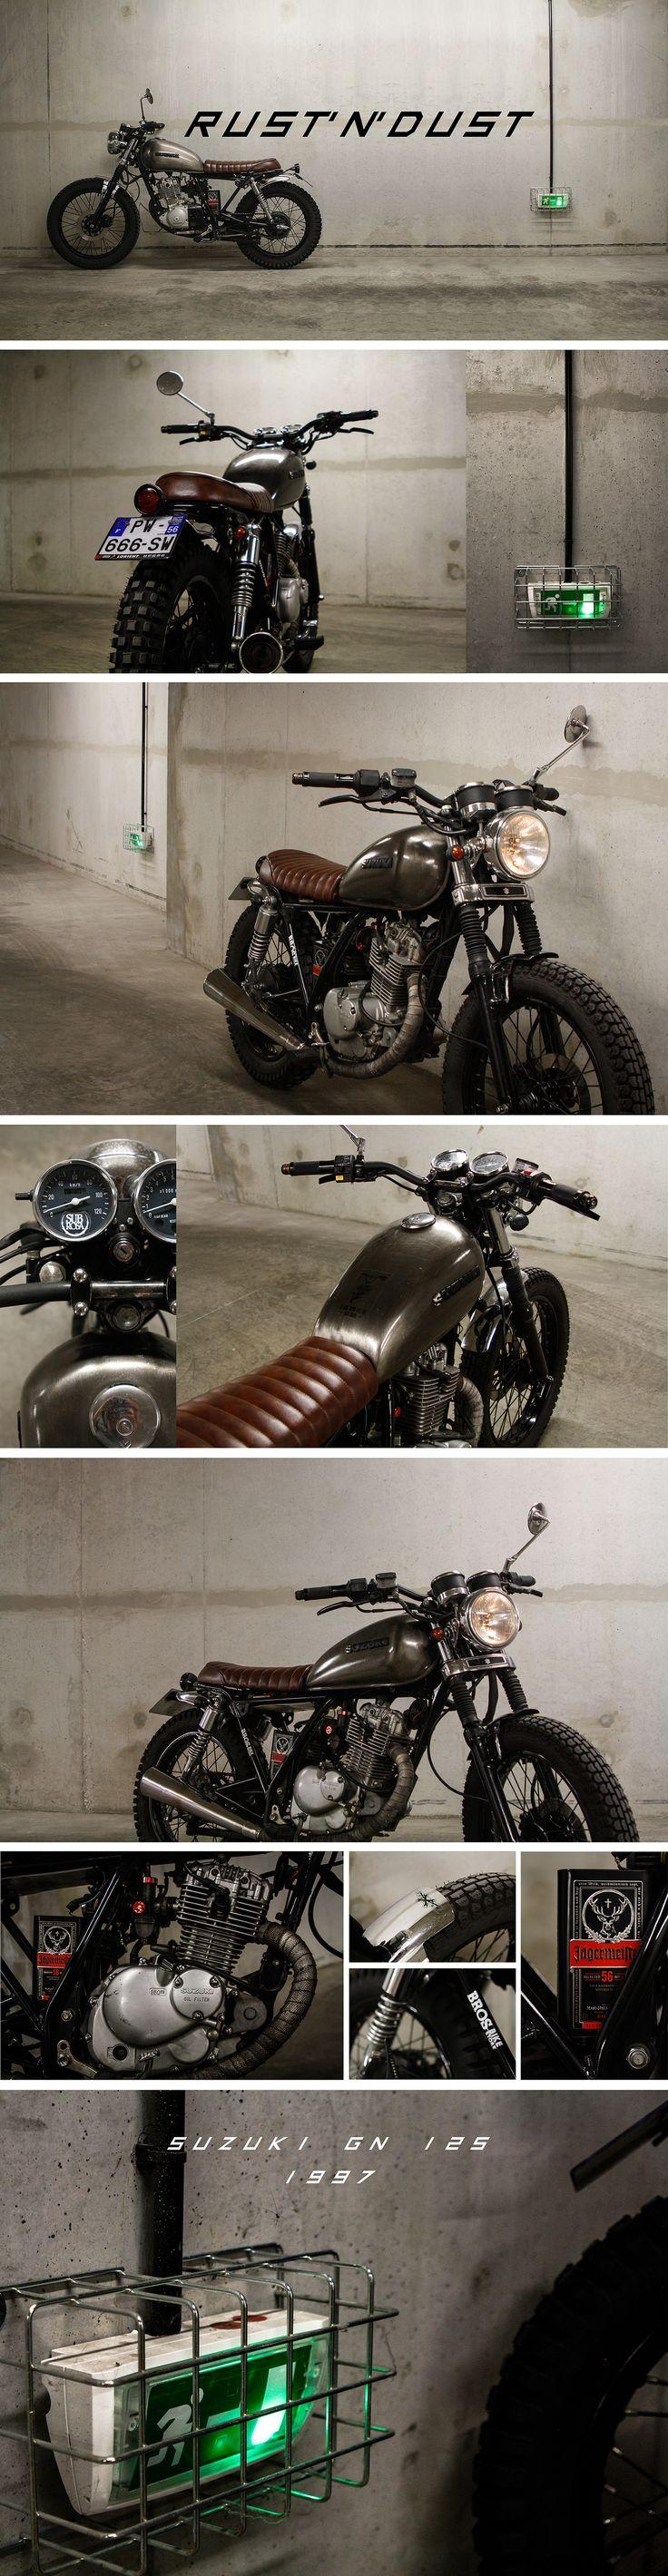 Suzuki GN 125 street tracker bratstyle scrambler cafe racer custom motorcycle honda cm moto